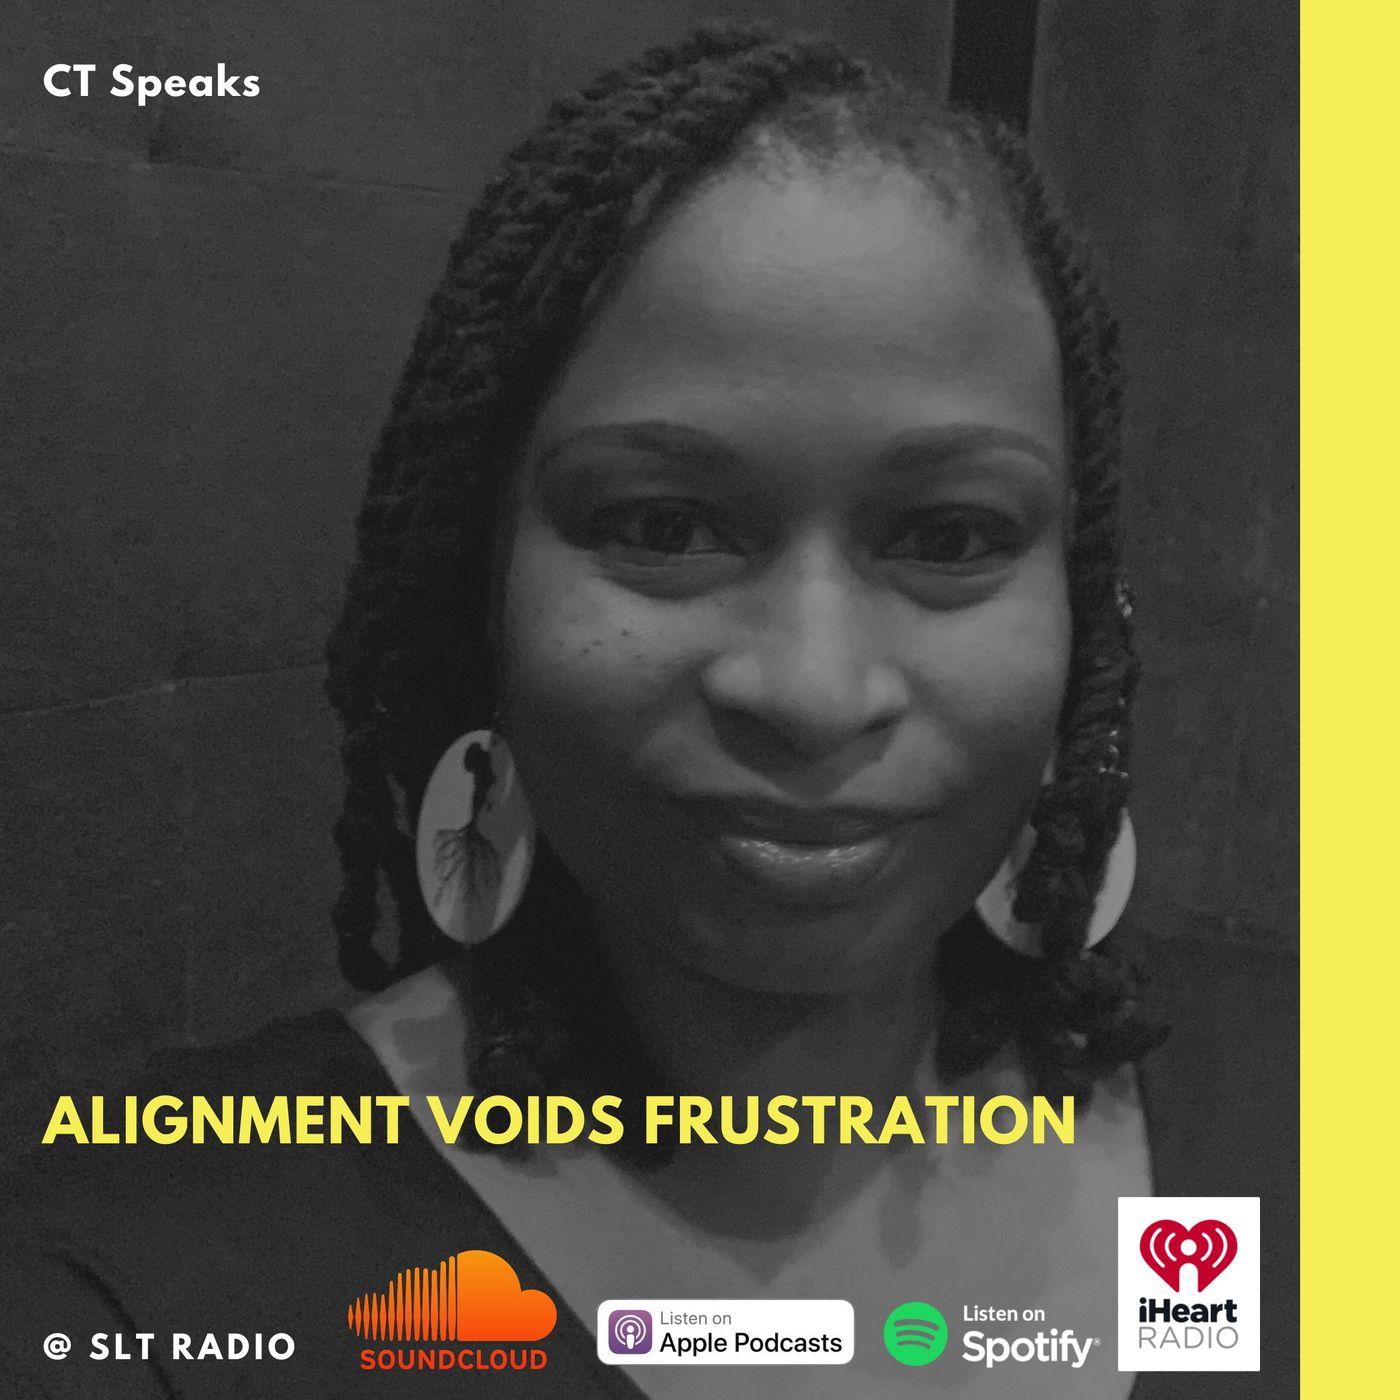 3.30 - GM2Leader - Alignment Voids Frustration - CT Speaks (Host)